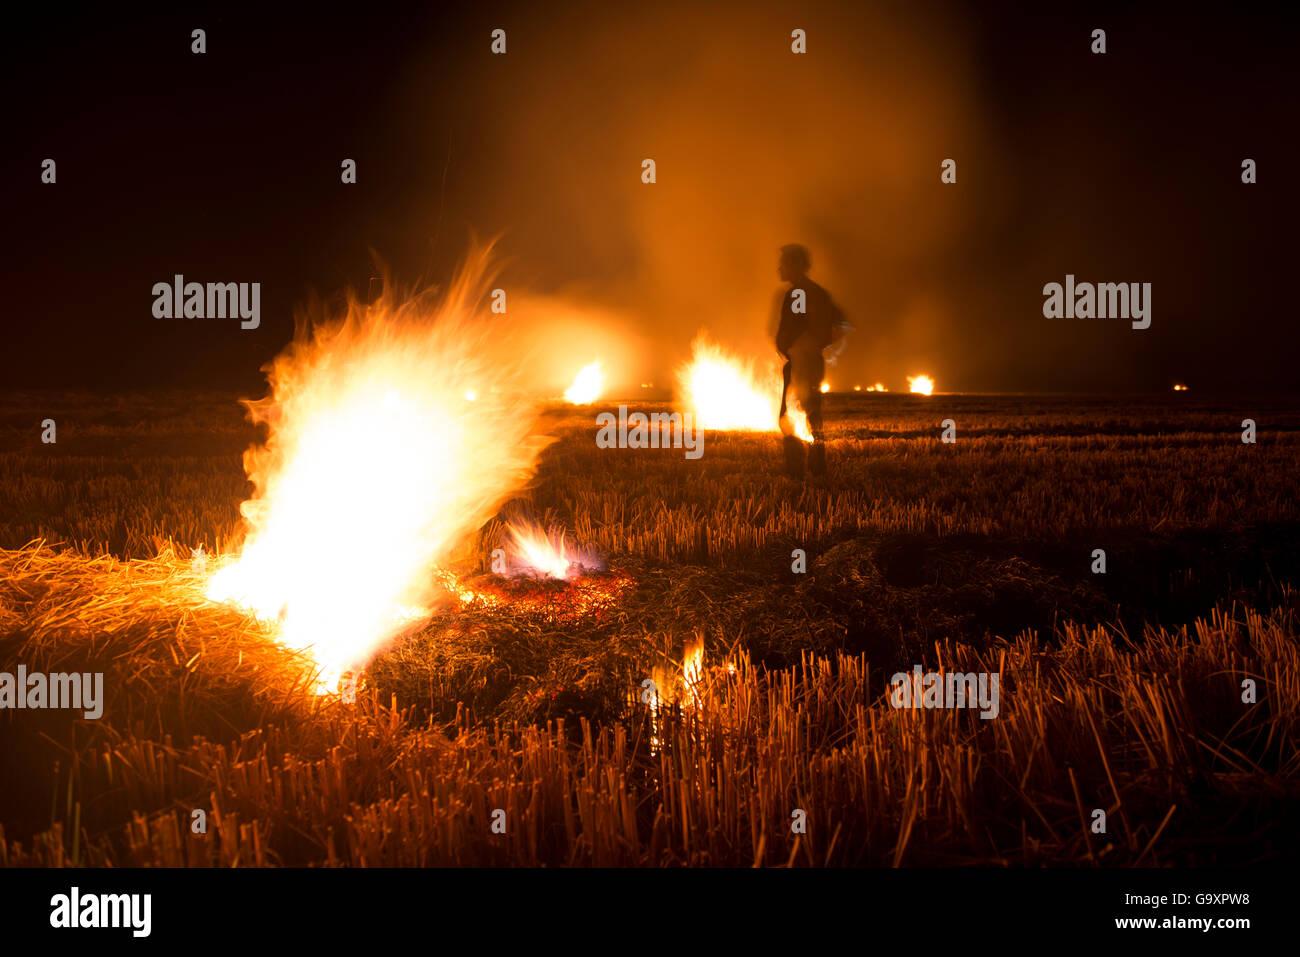 Burning of rice field after harvest, Camargue, France, October. - Stock Image